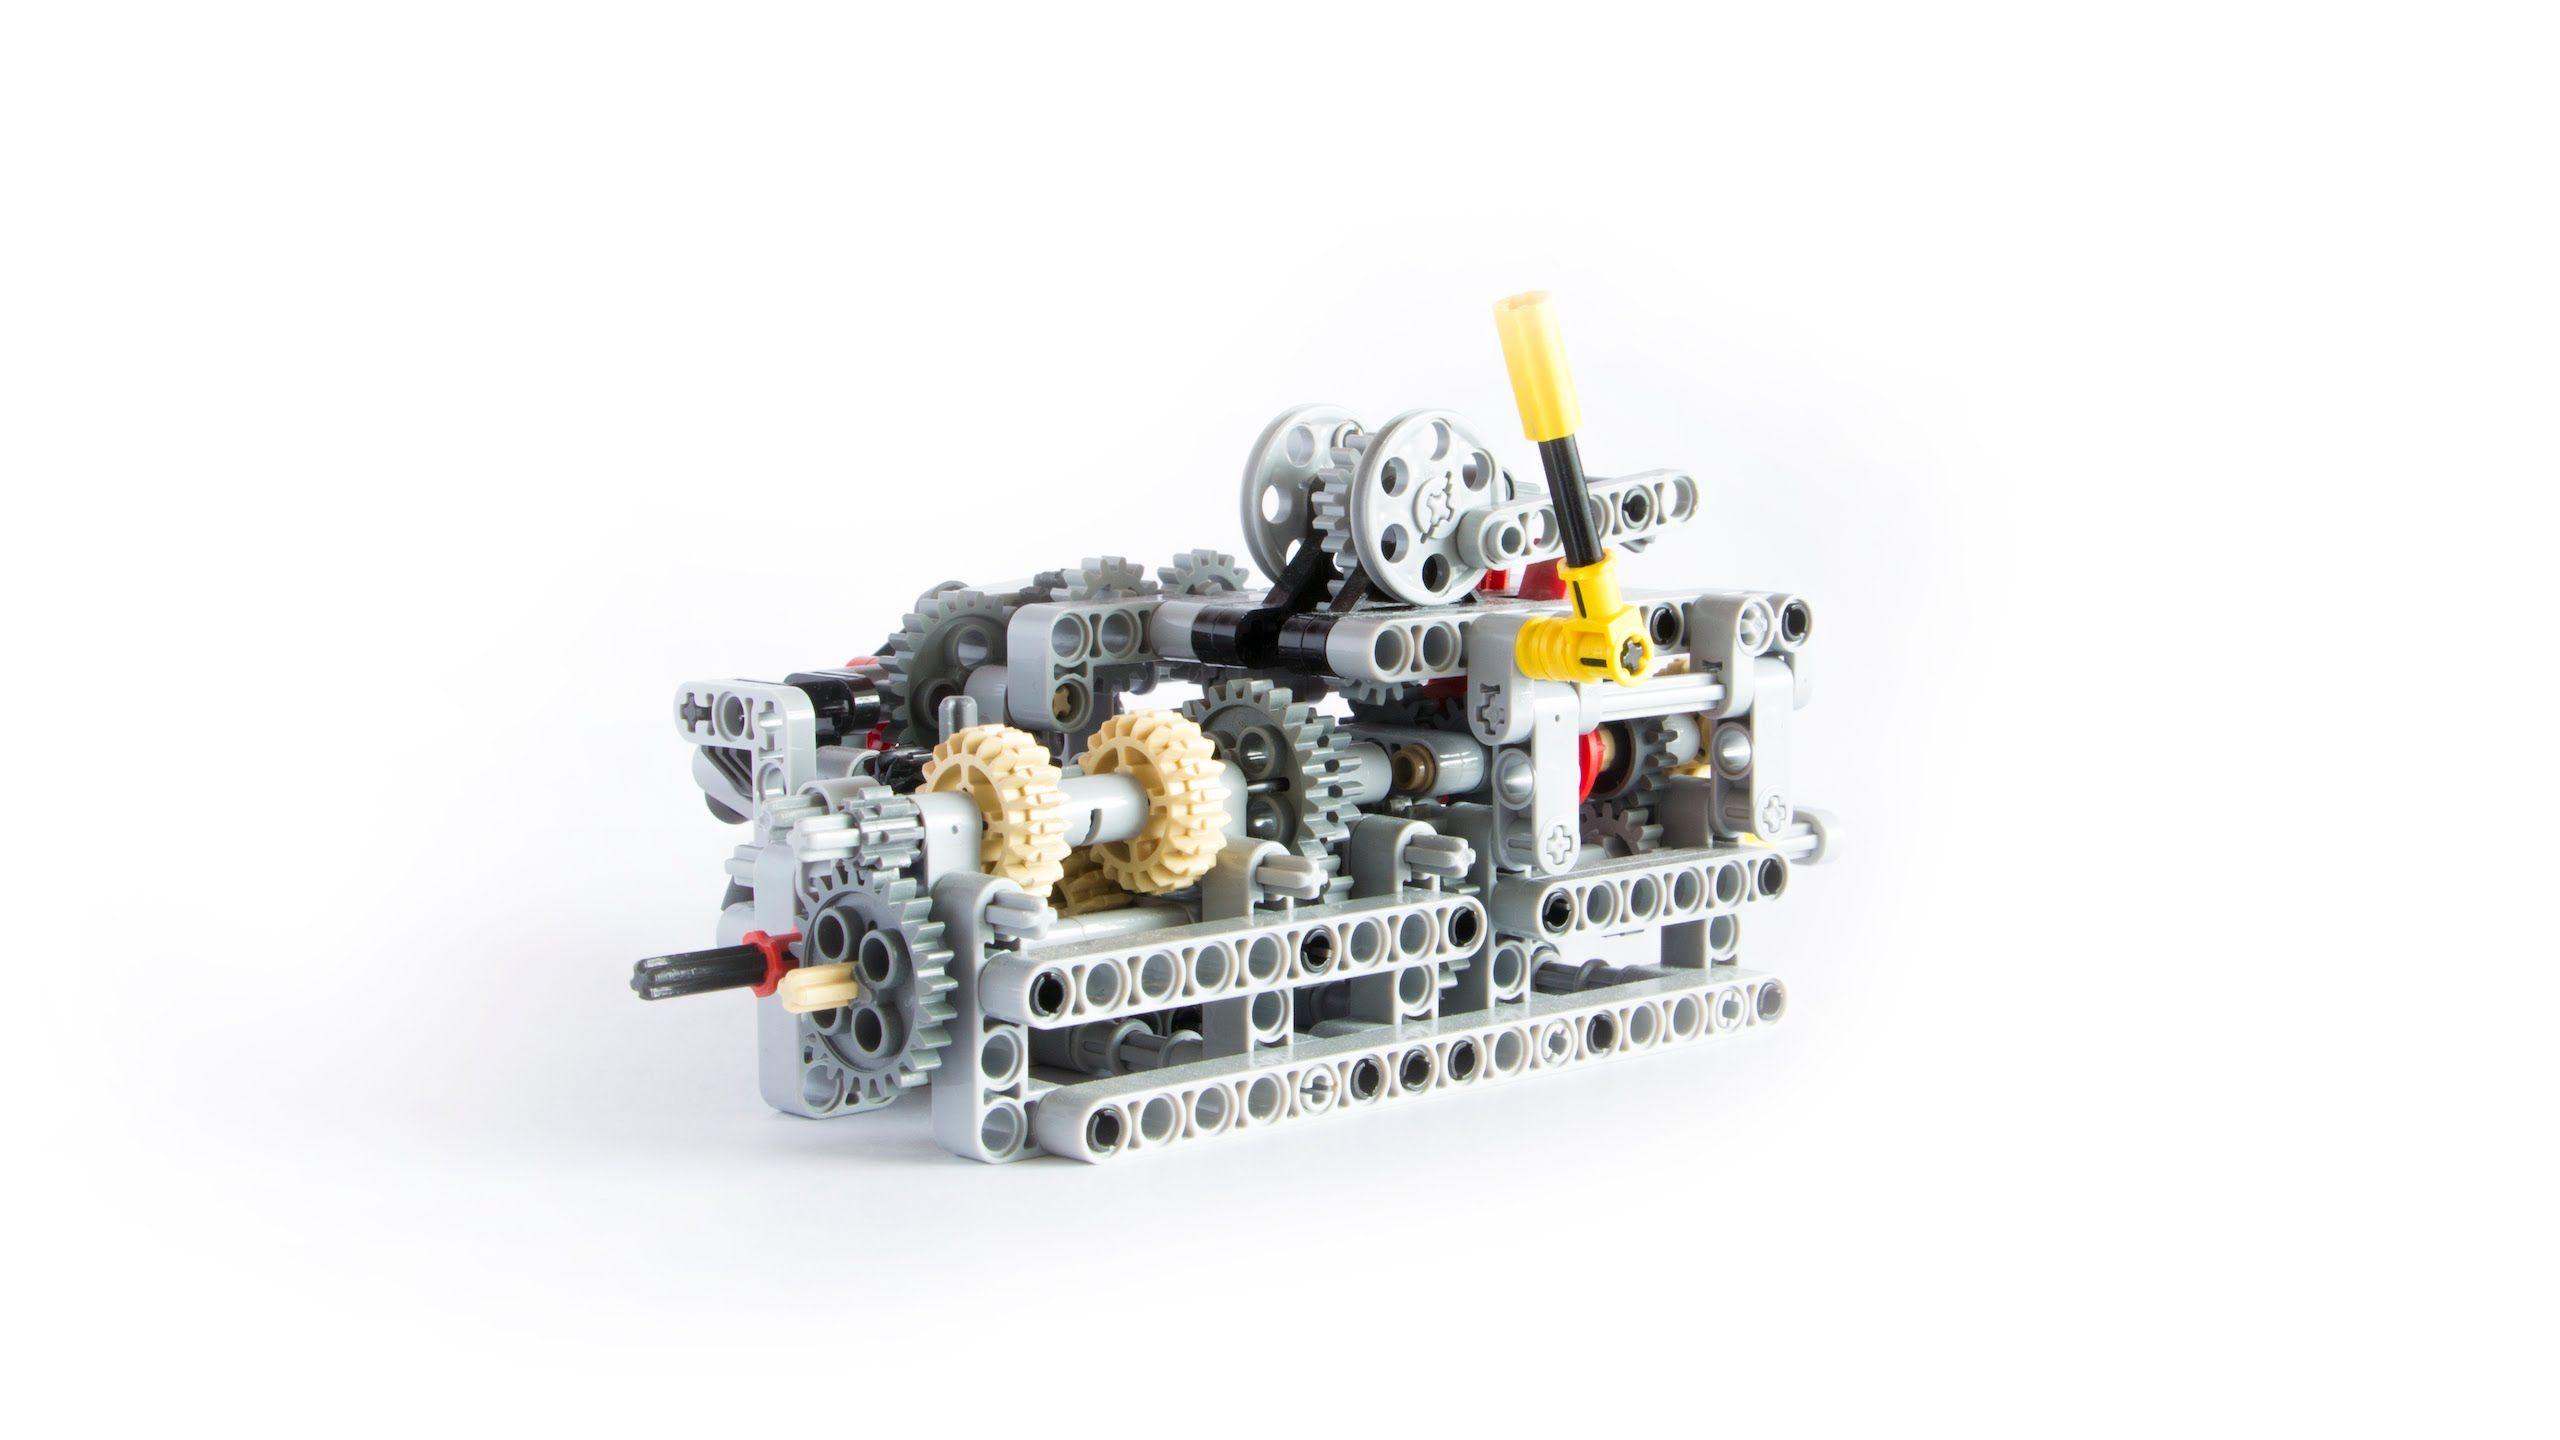 Pin By Aaron Ferguson On Legos Pinterest Lego Technic Lego And